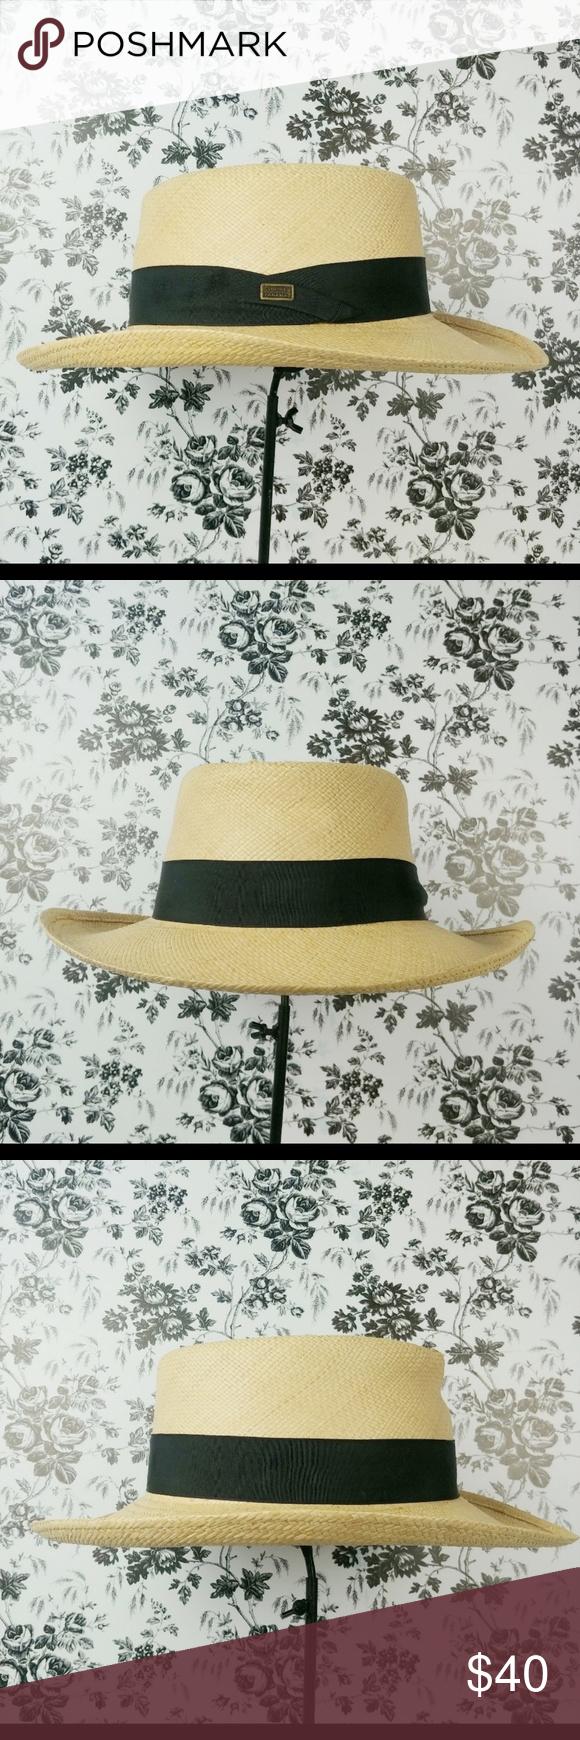 Pinzano Natural Straw Panama Hat Rare Sz Xxl Panama Hat Women Accessories Hats Straw